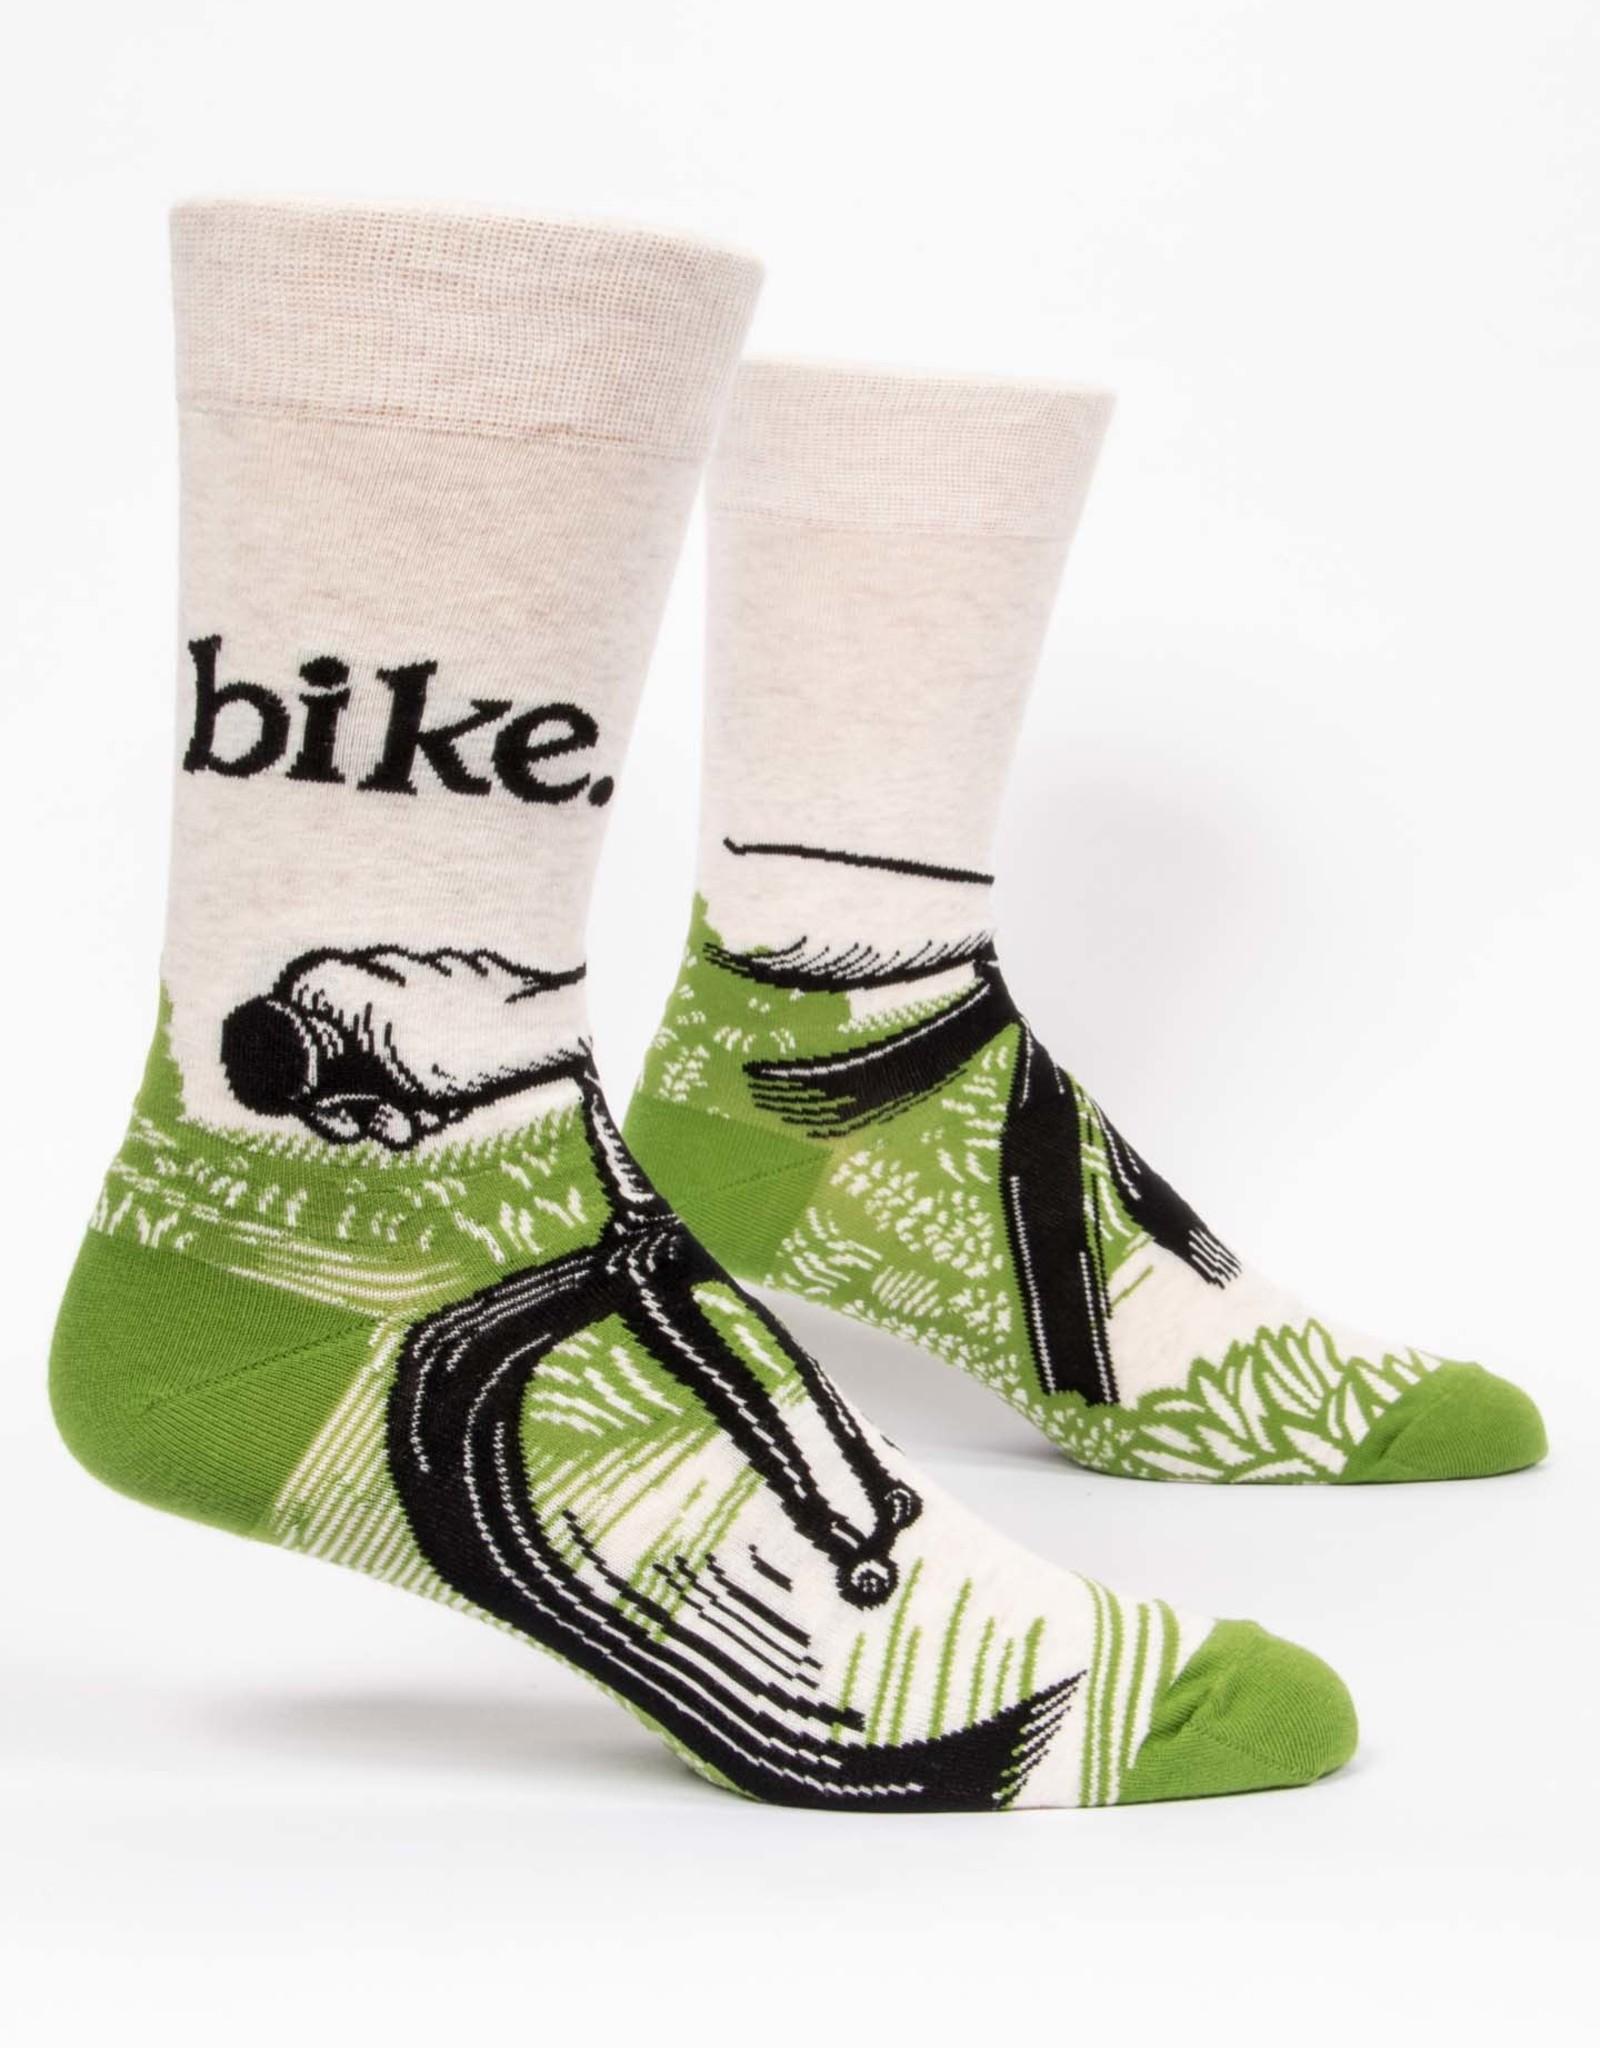 Socks (Mens)  - Bike Path